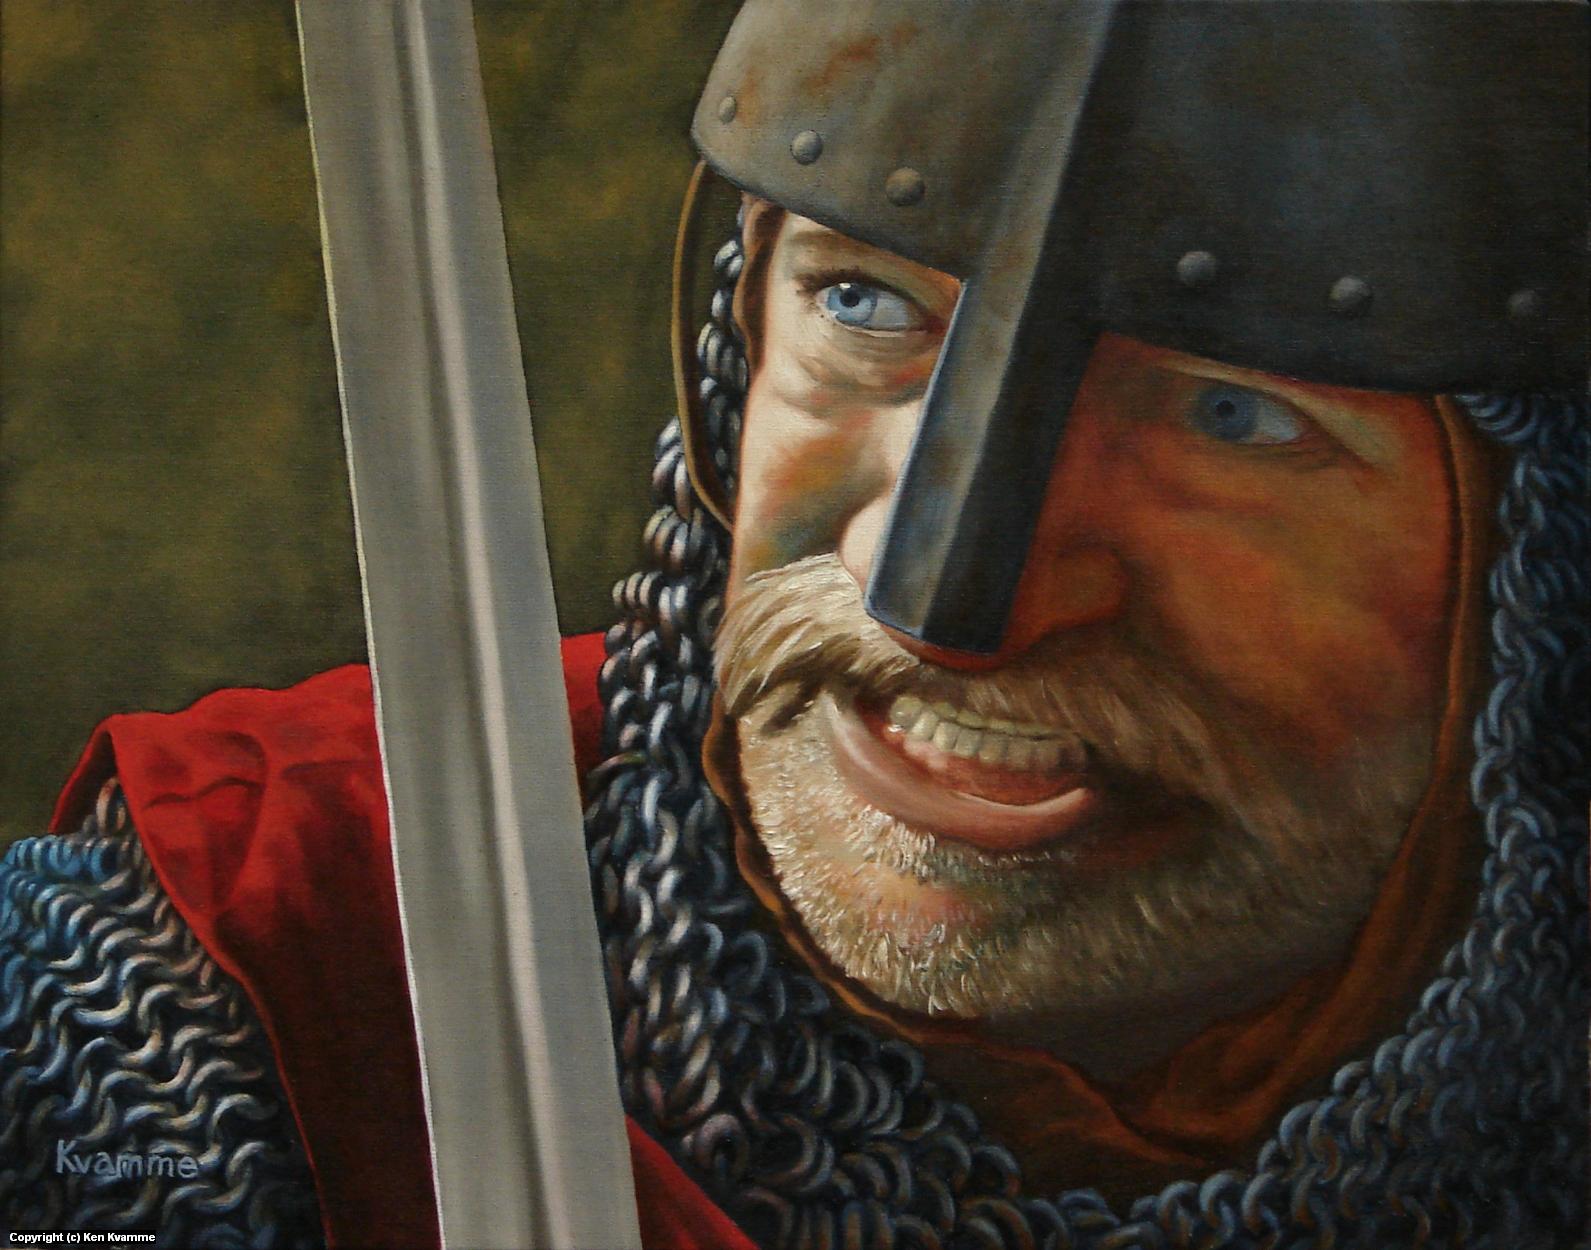 Knight Defender Artwork by Ken Kvamme